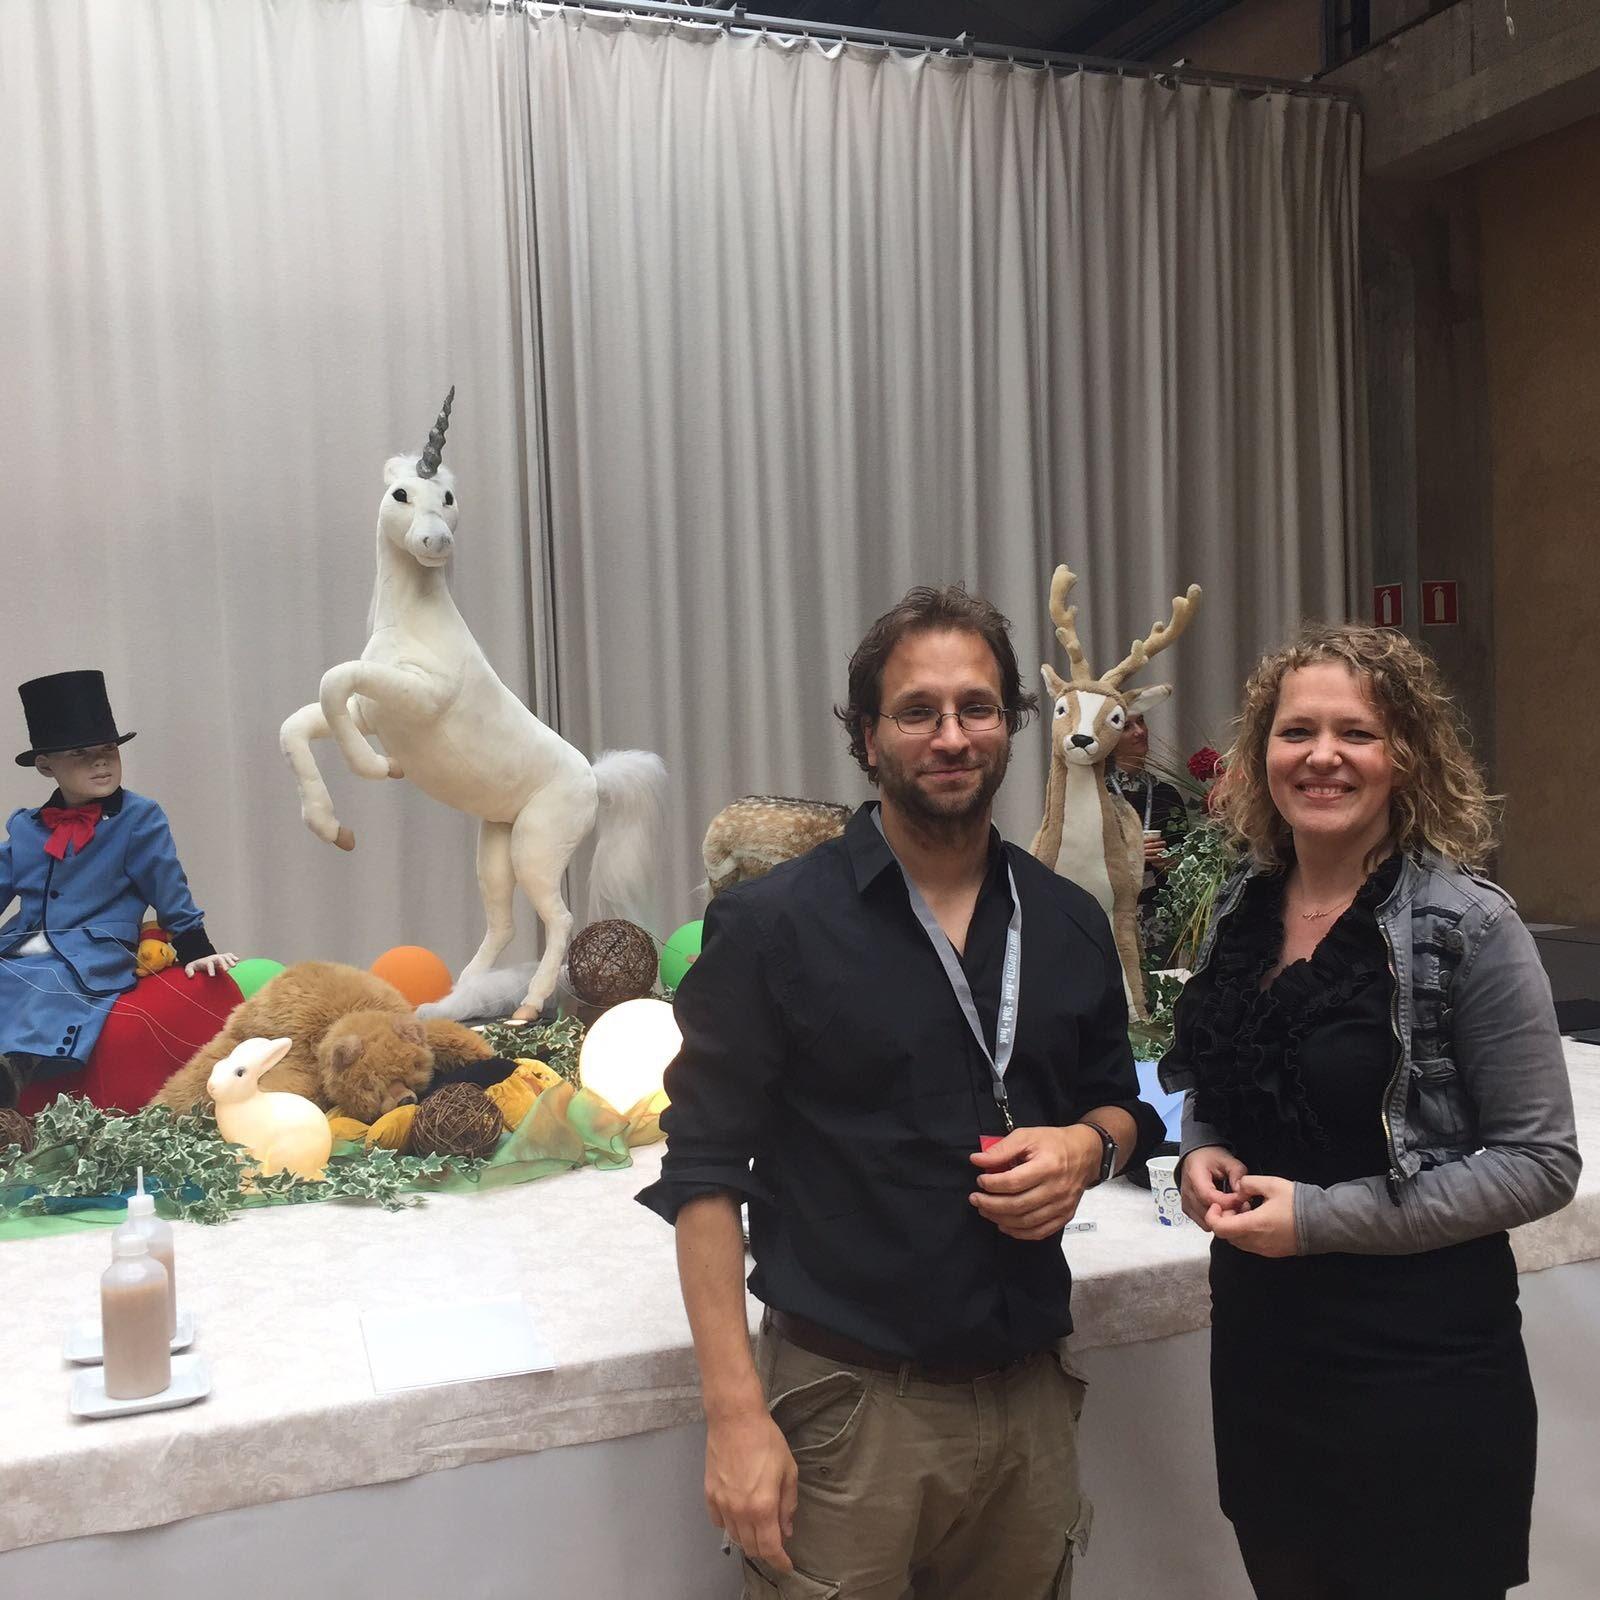 From right to left: Marieke Nooren, Falk Hübner & the Unicorn.